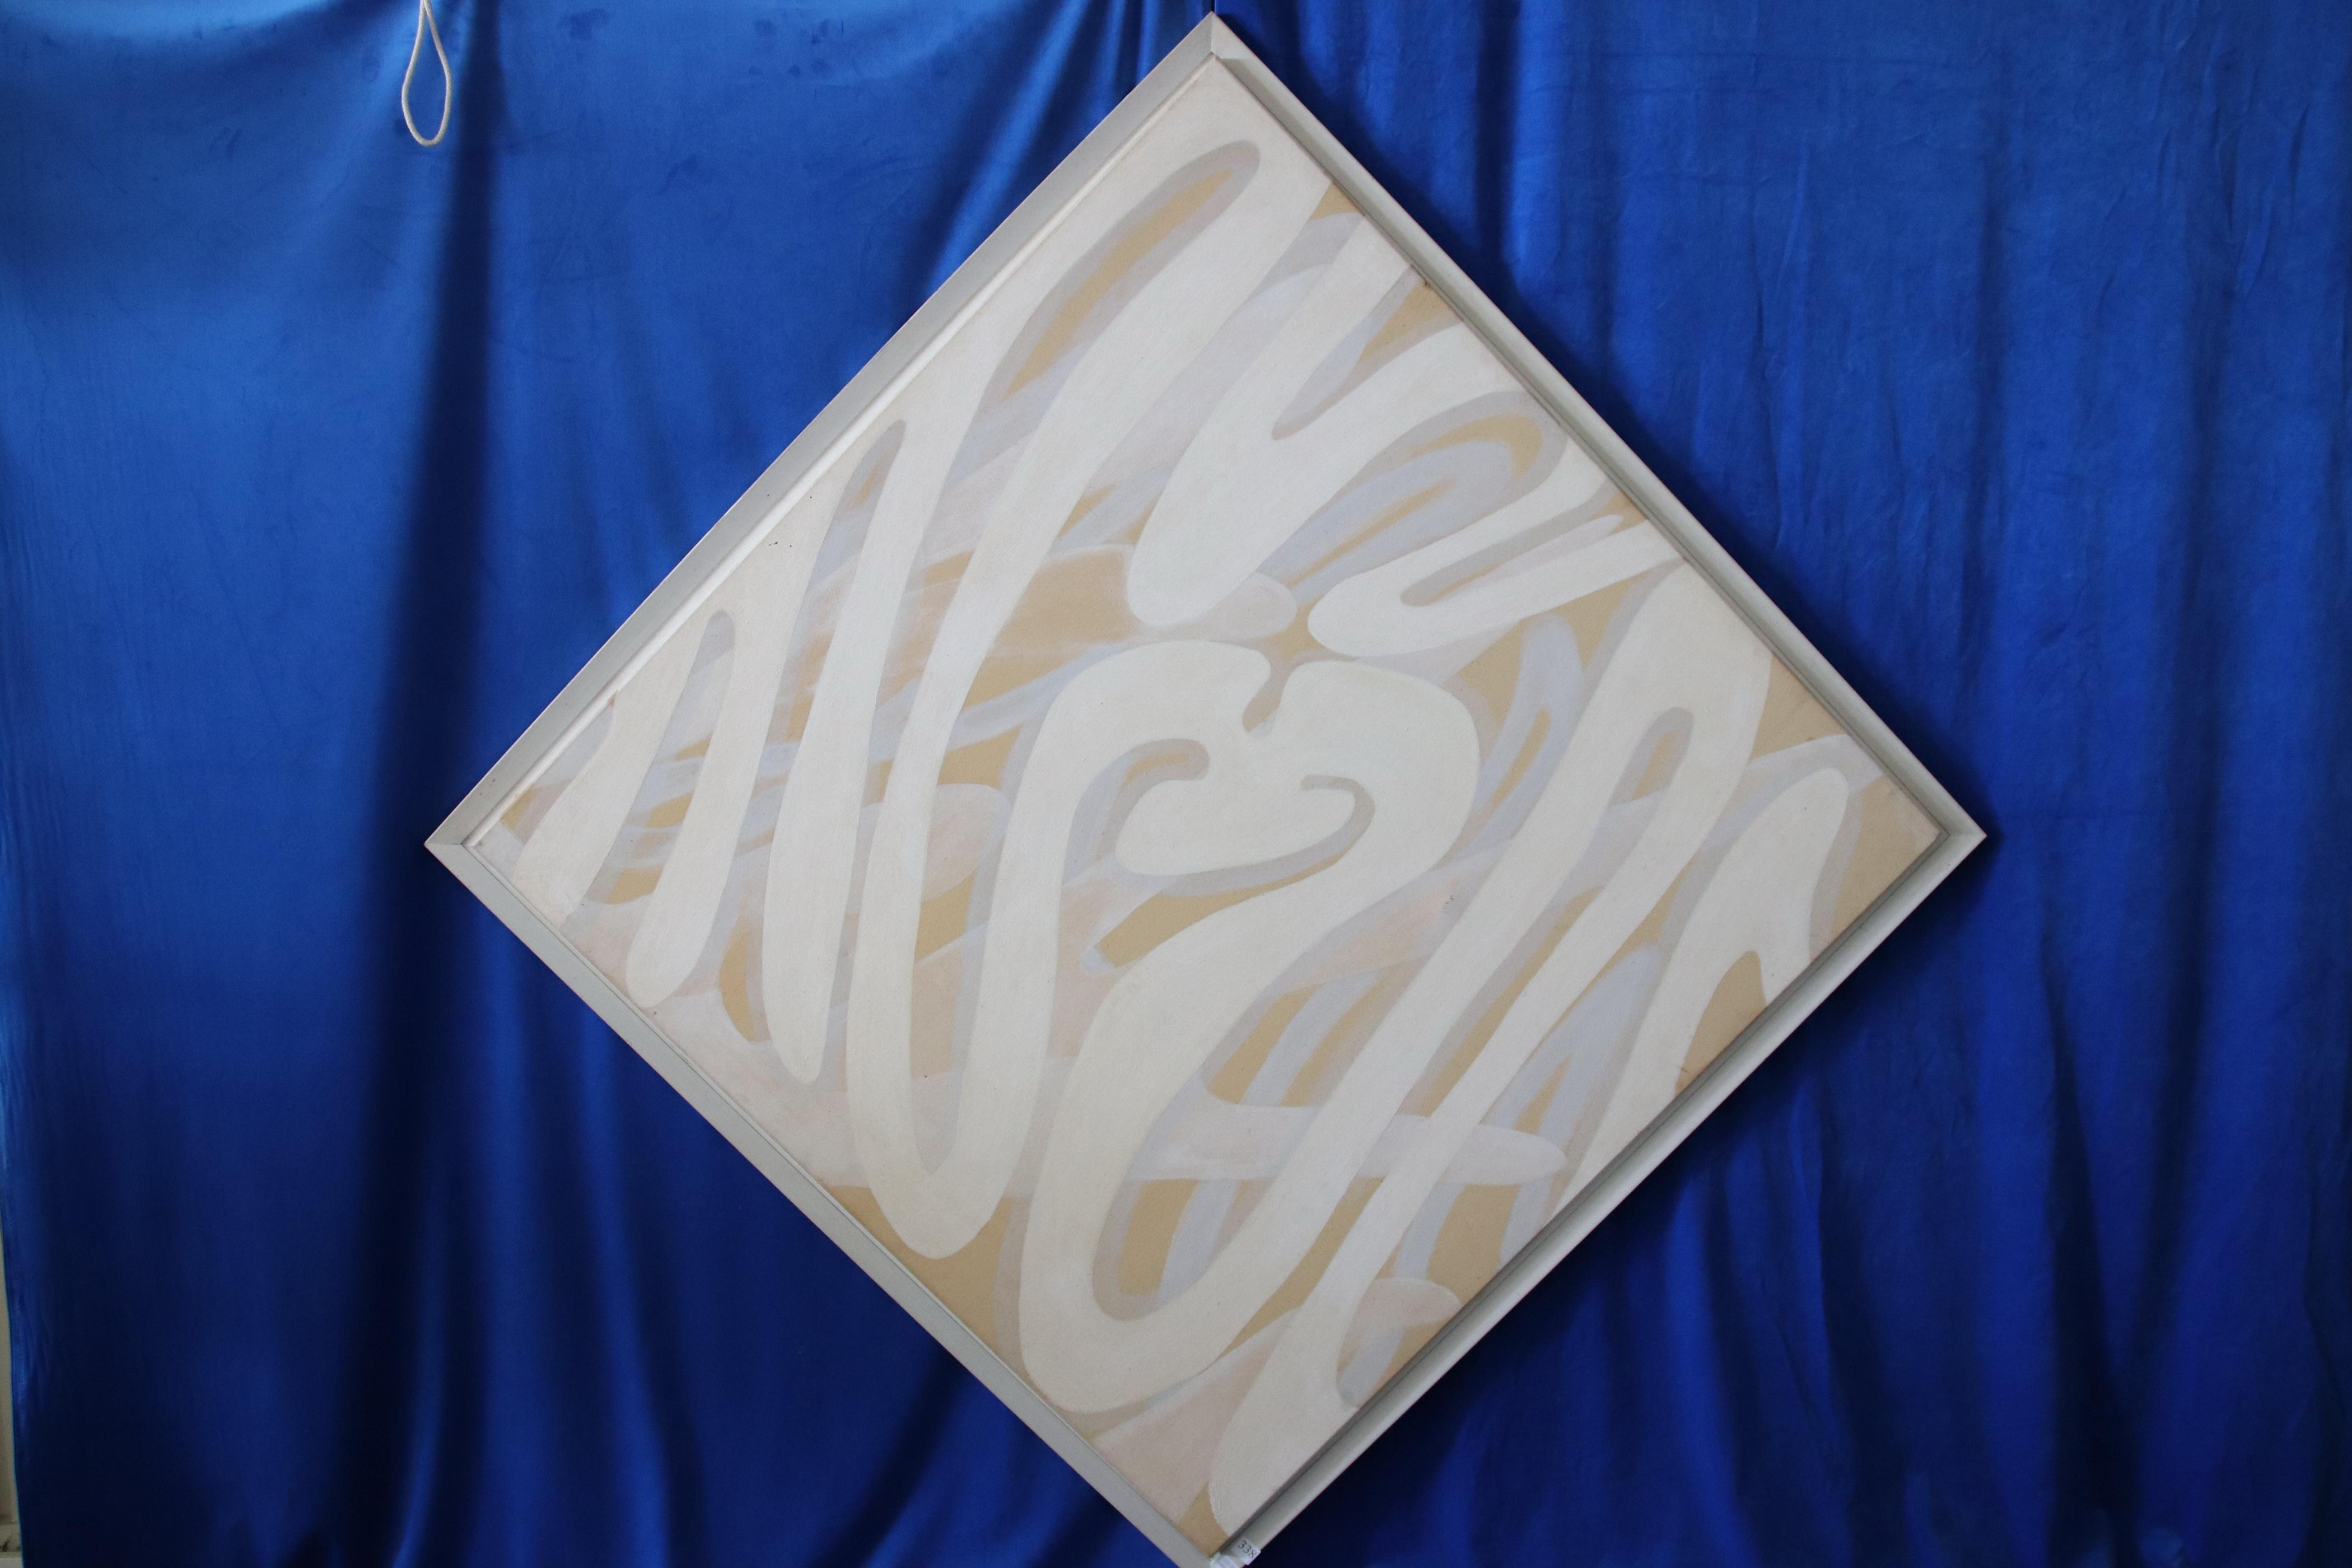 LARGE CAROLE SYMONDS ABSTRACT ART